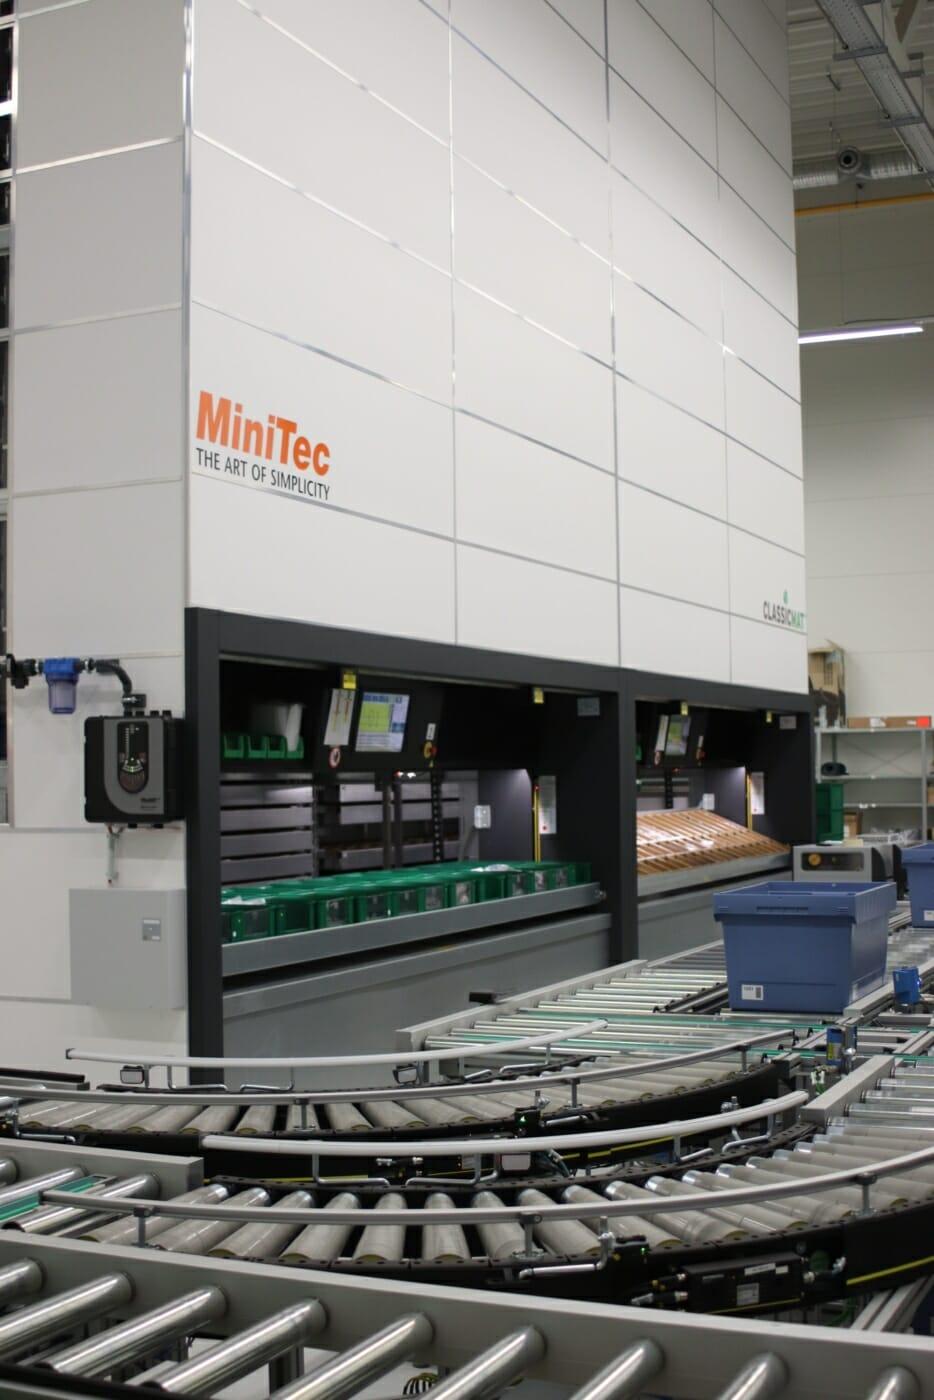 minitec-0418-inhouse-2